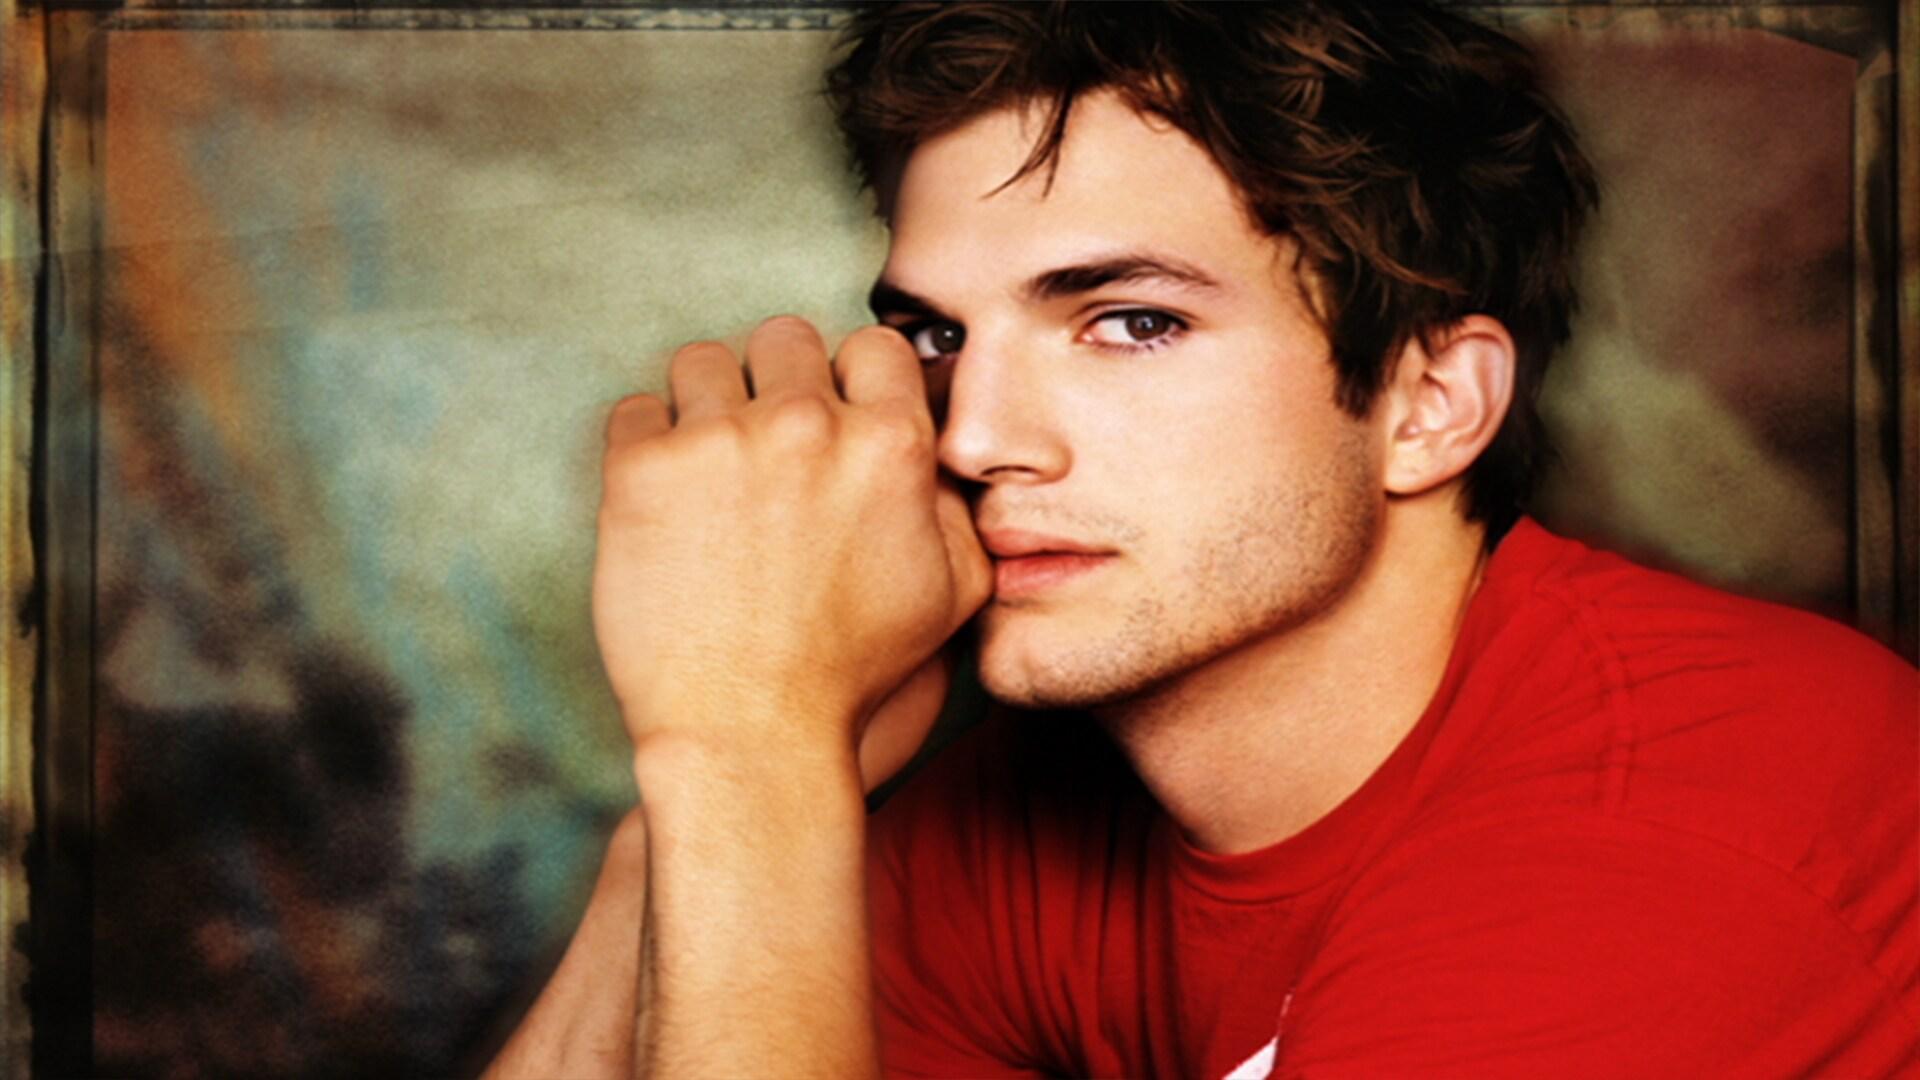 Ashton Kutcher: May 3, 2003